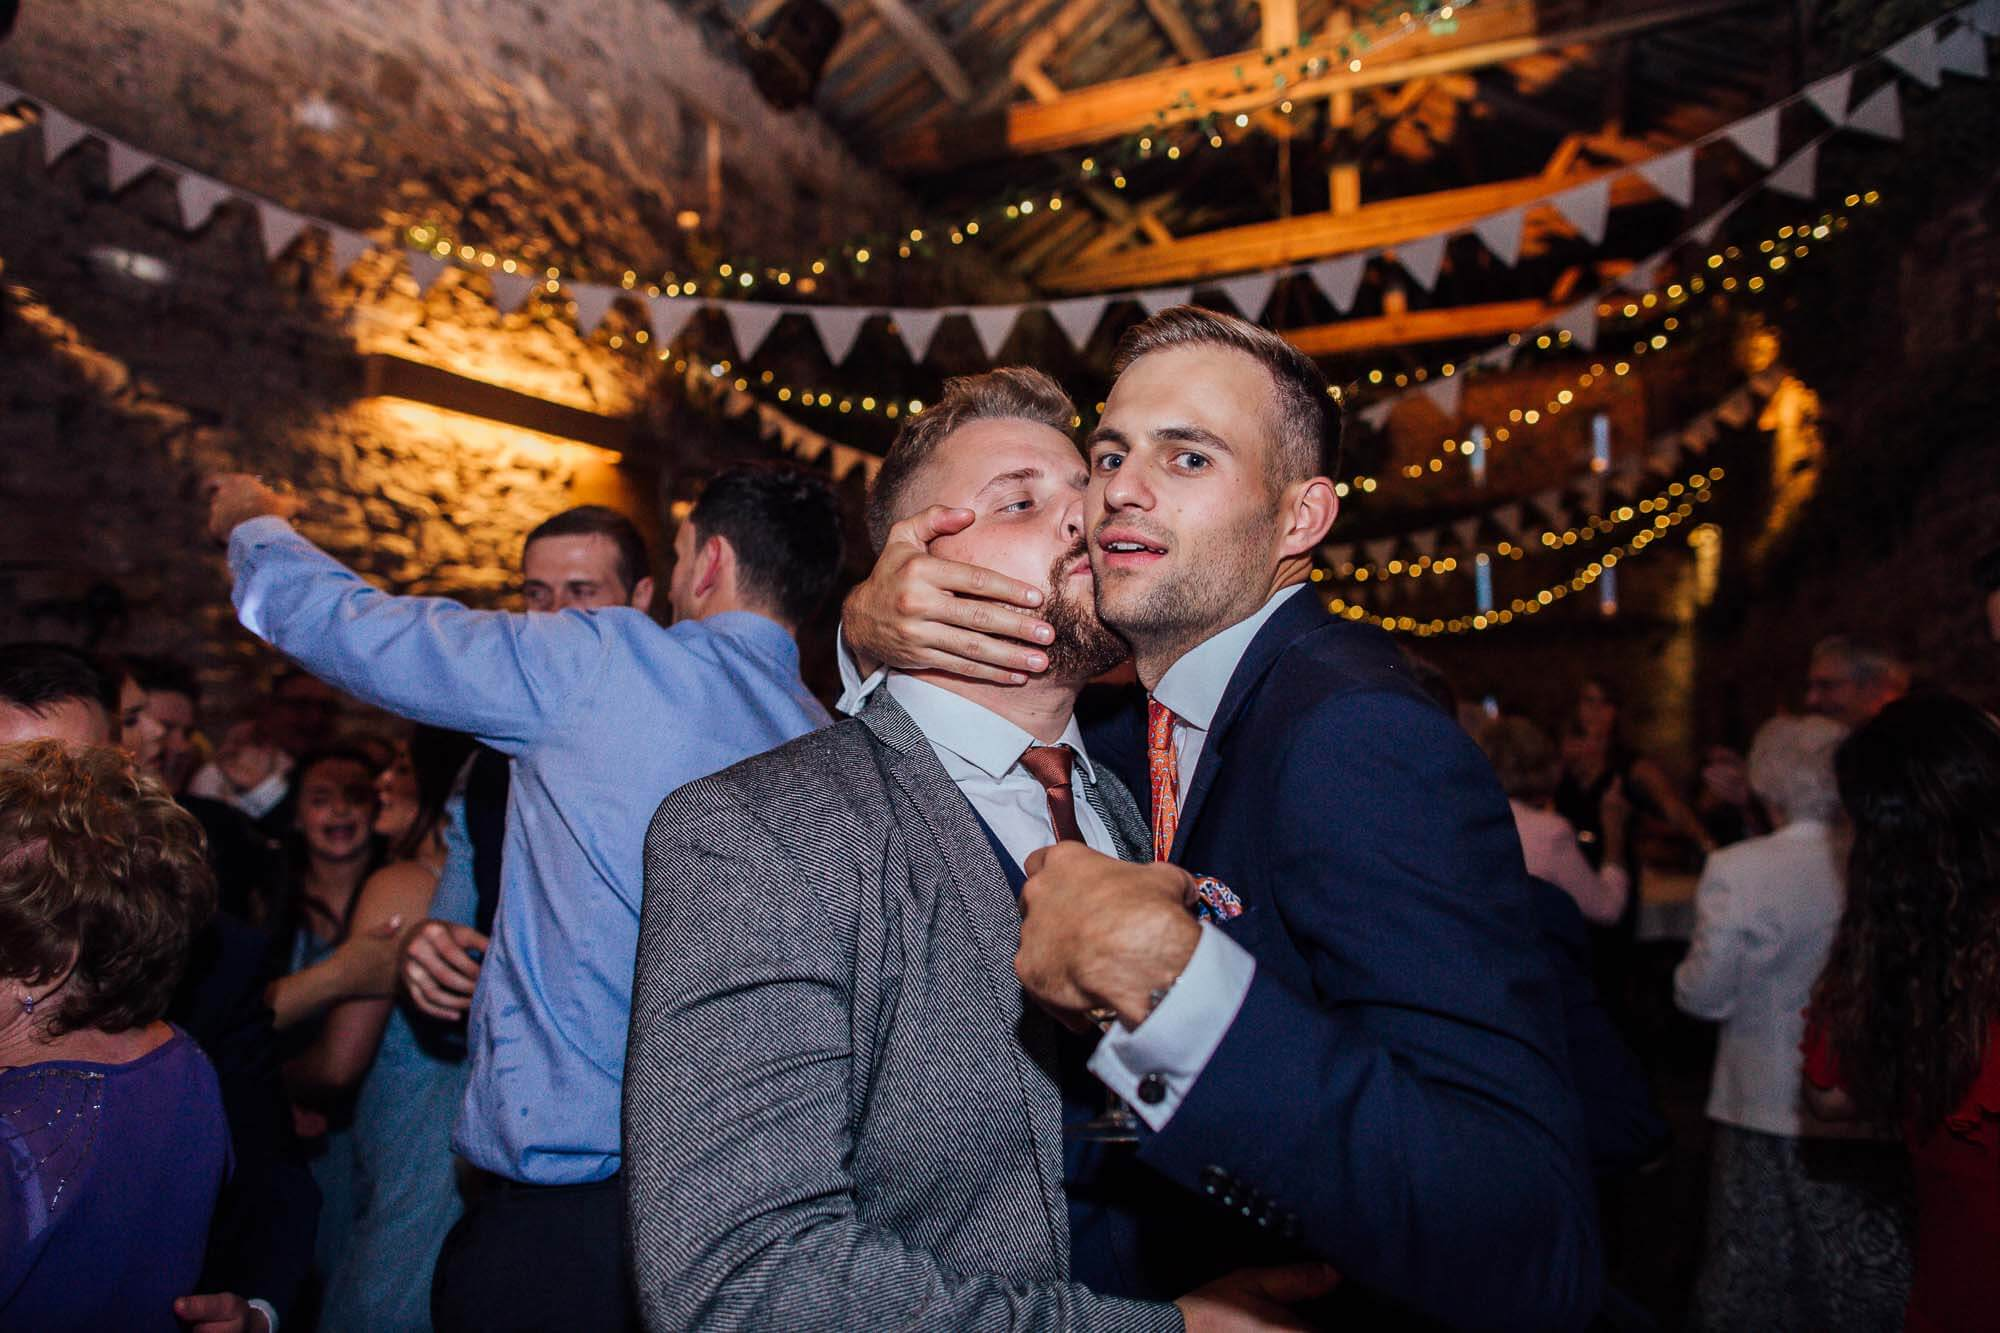 Beth & Morgan 41 | Bristol Wedding Photographer